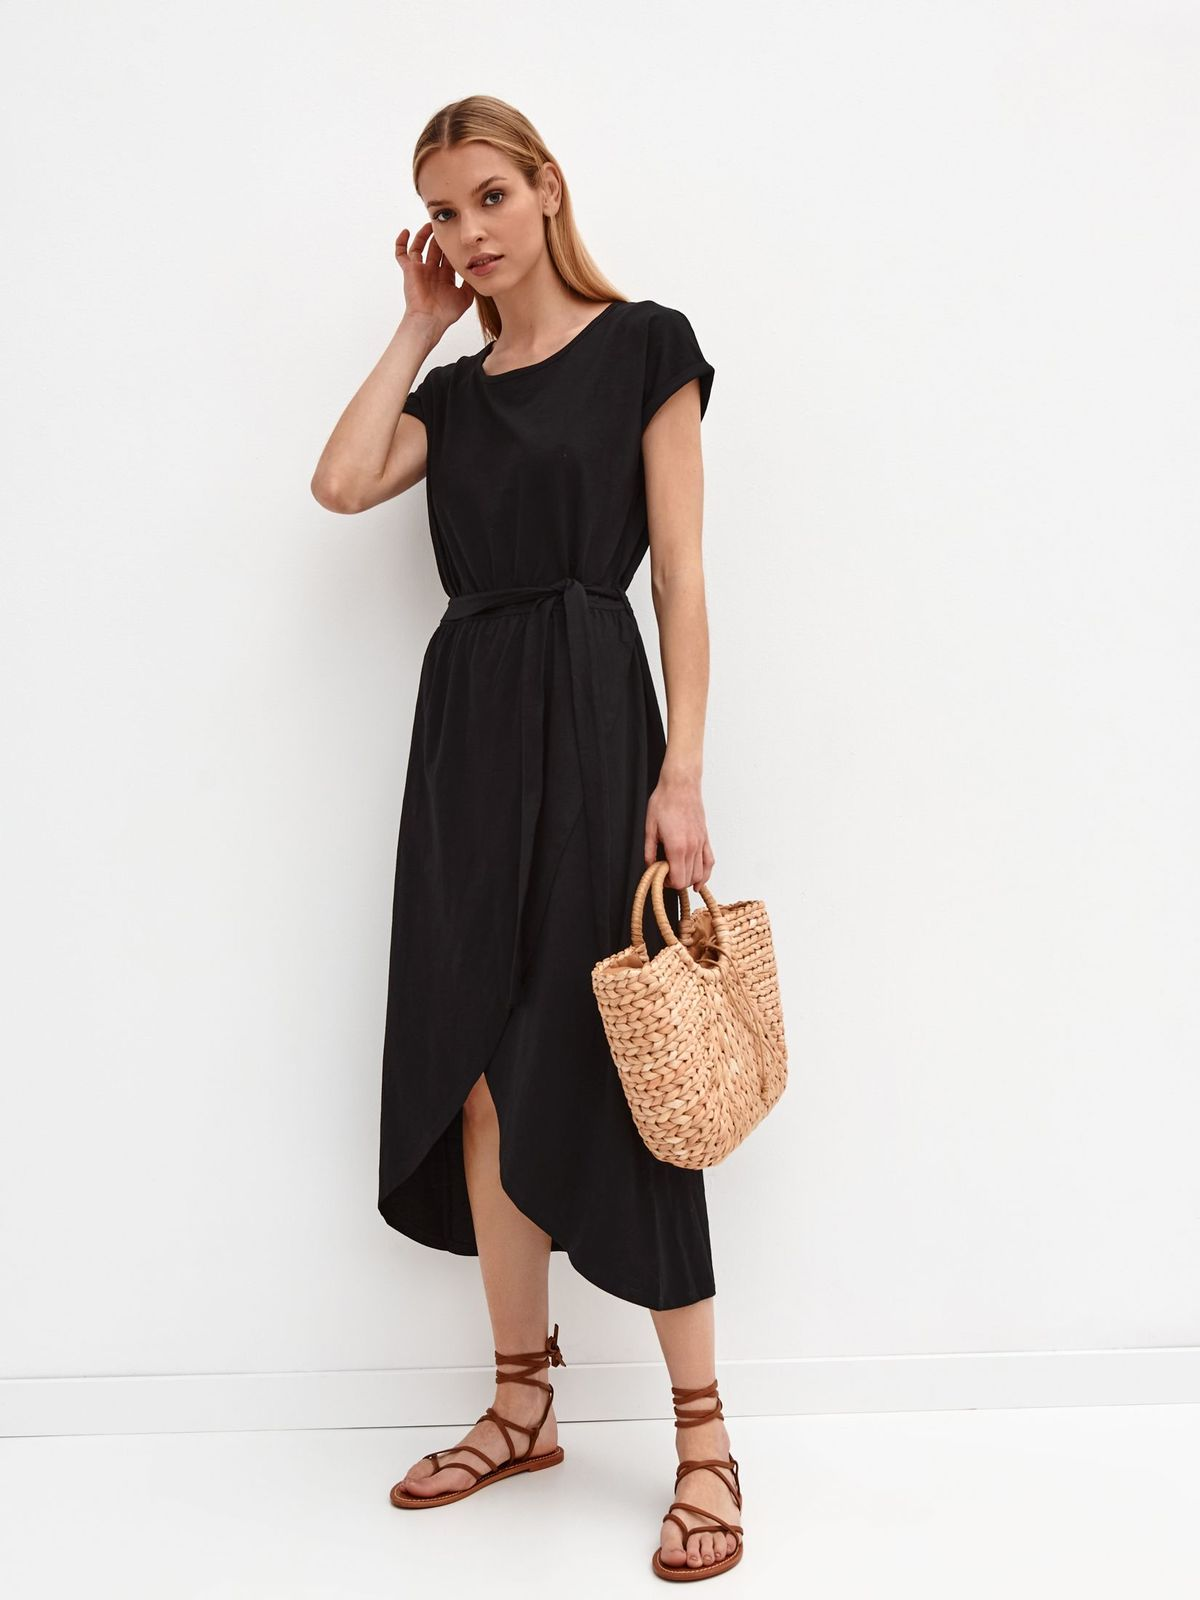 Black dress cloche asymmetrical cotton wrap around